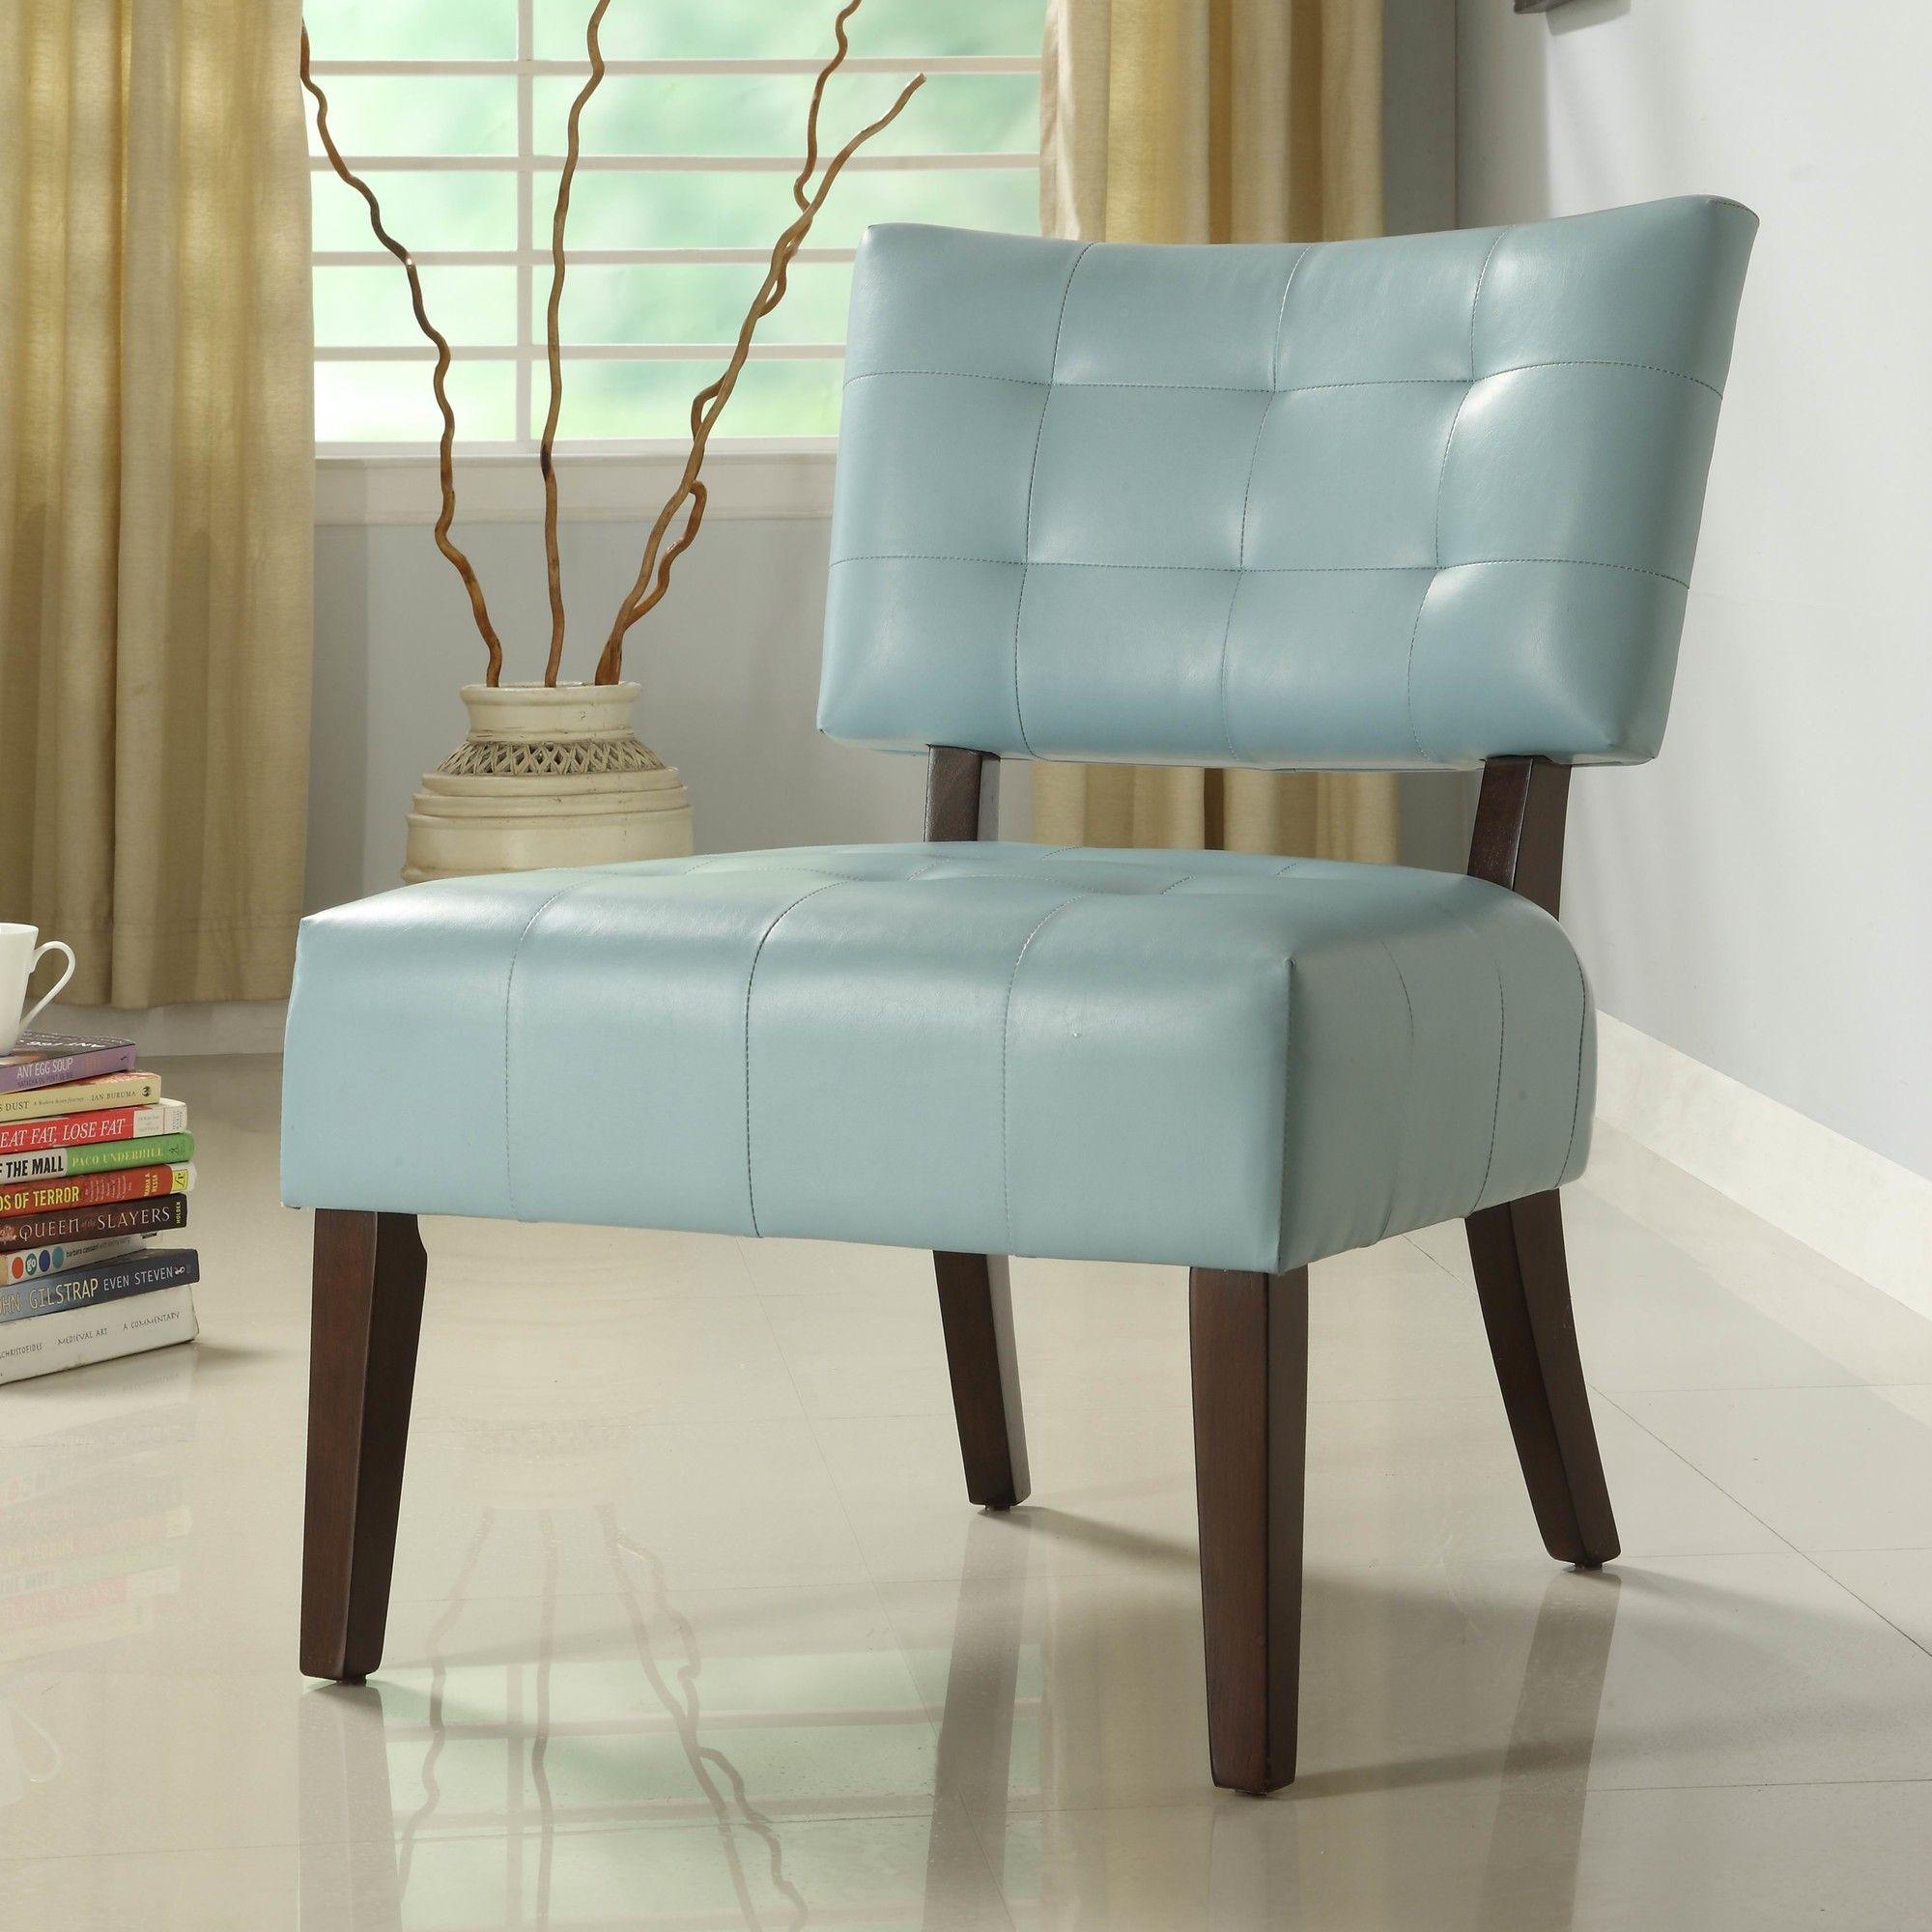 Woodhaven Hill Warner Vinyl Slipper Chair AllModern